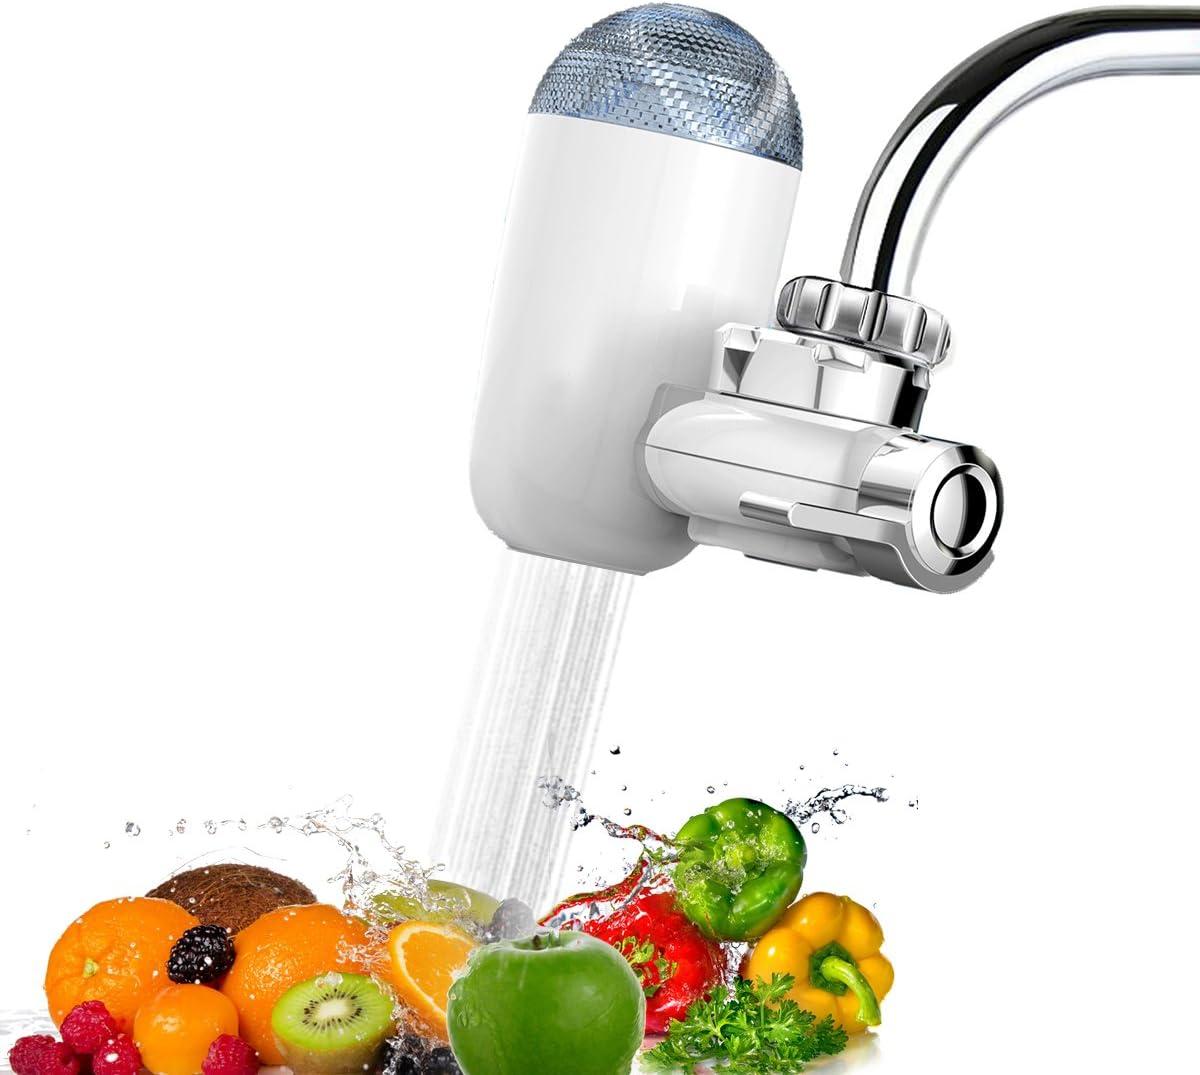 Filtro de agua para grifo, multicapa, filtro para grifo de cocina, purificador de agua con cartucho de filtro de cerámica: Amazon.es: Hogar